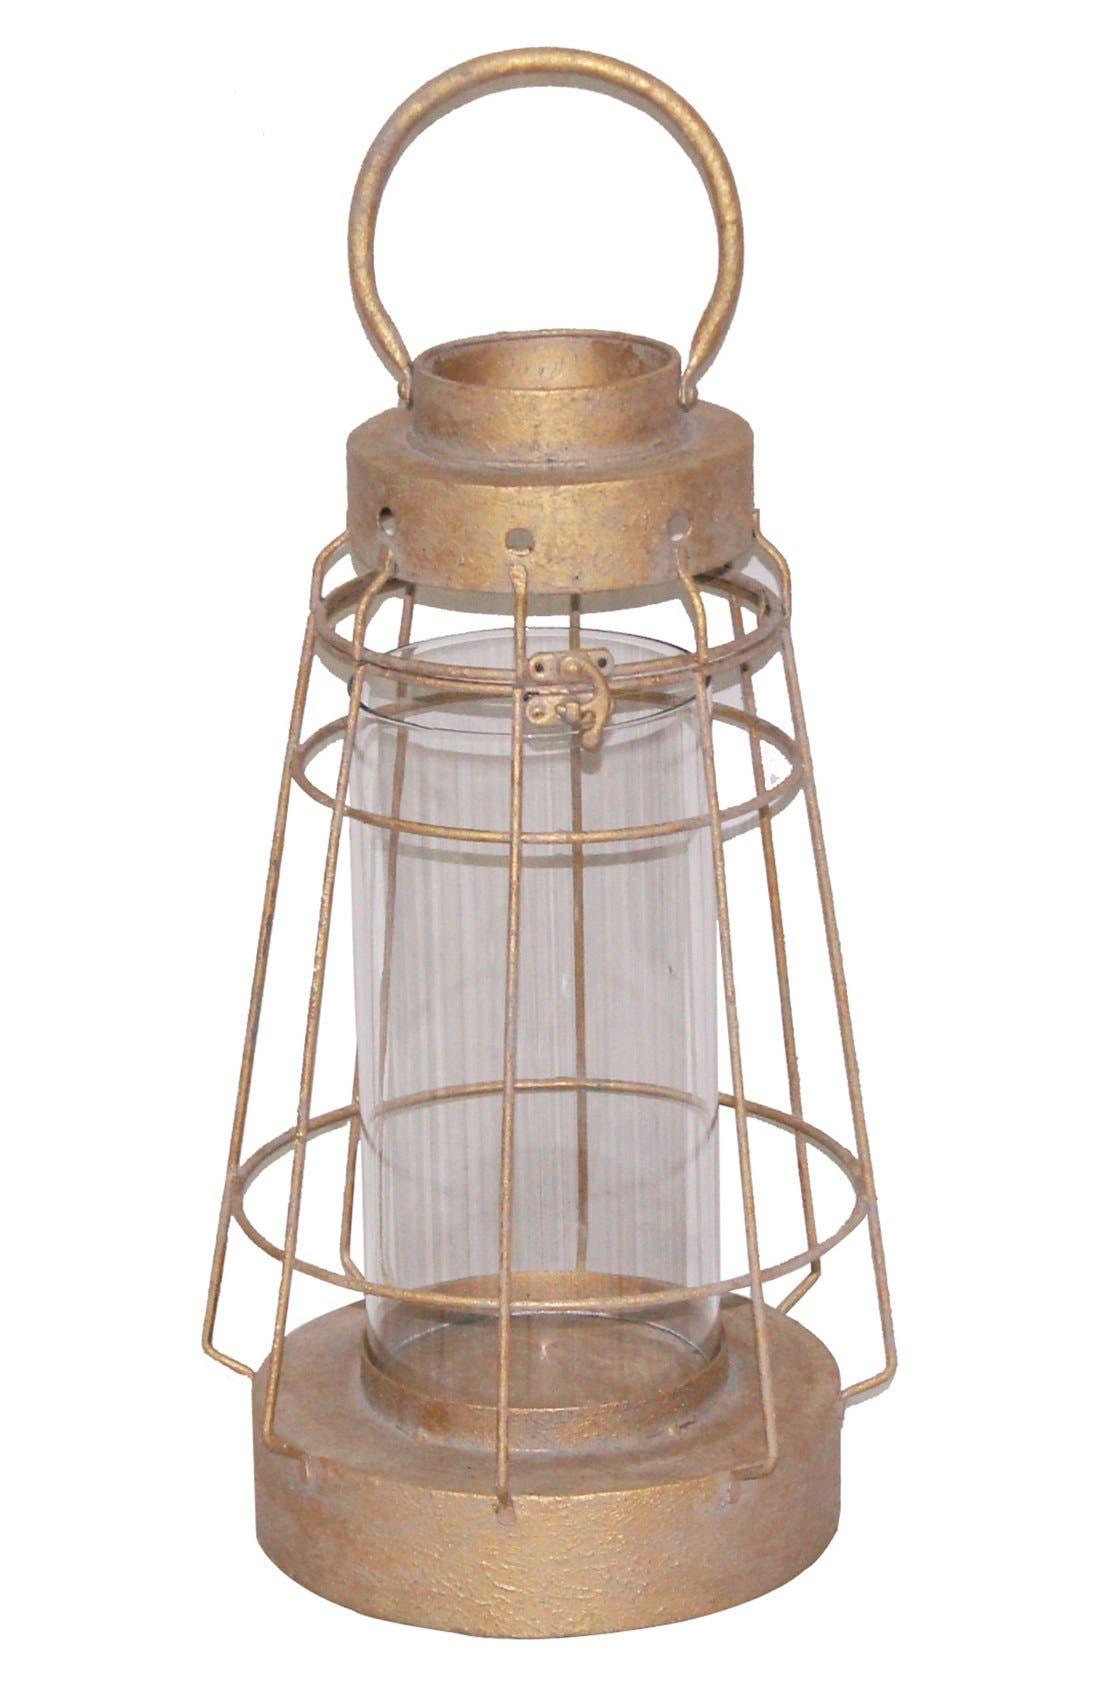 Main Image - Creative Co-Op Wood & Metal Lantern Candle Holder